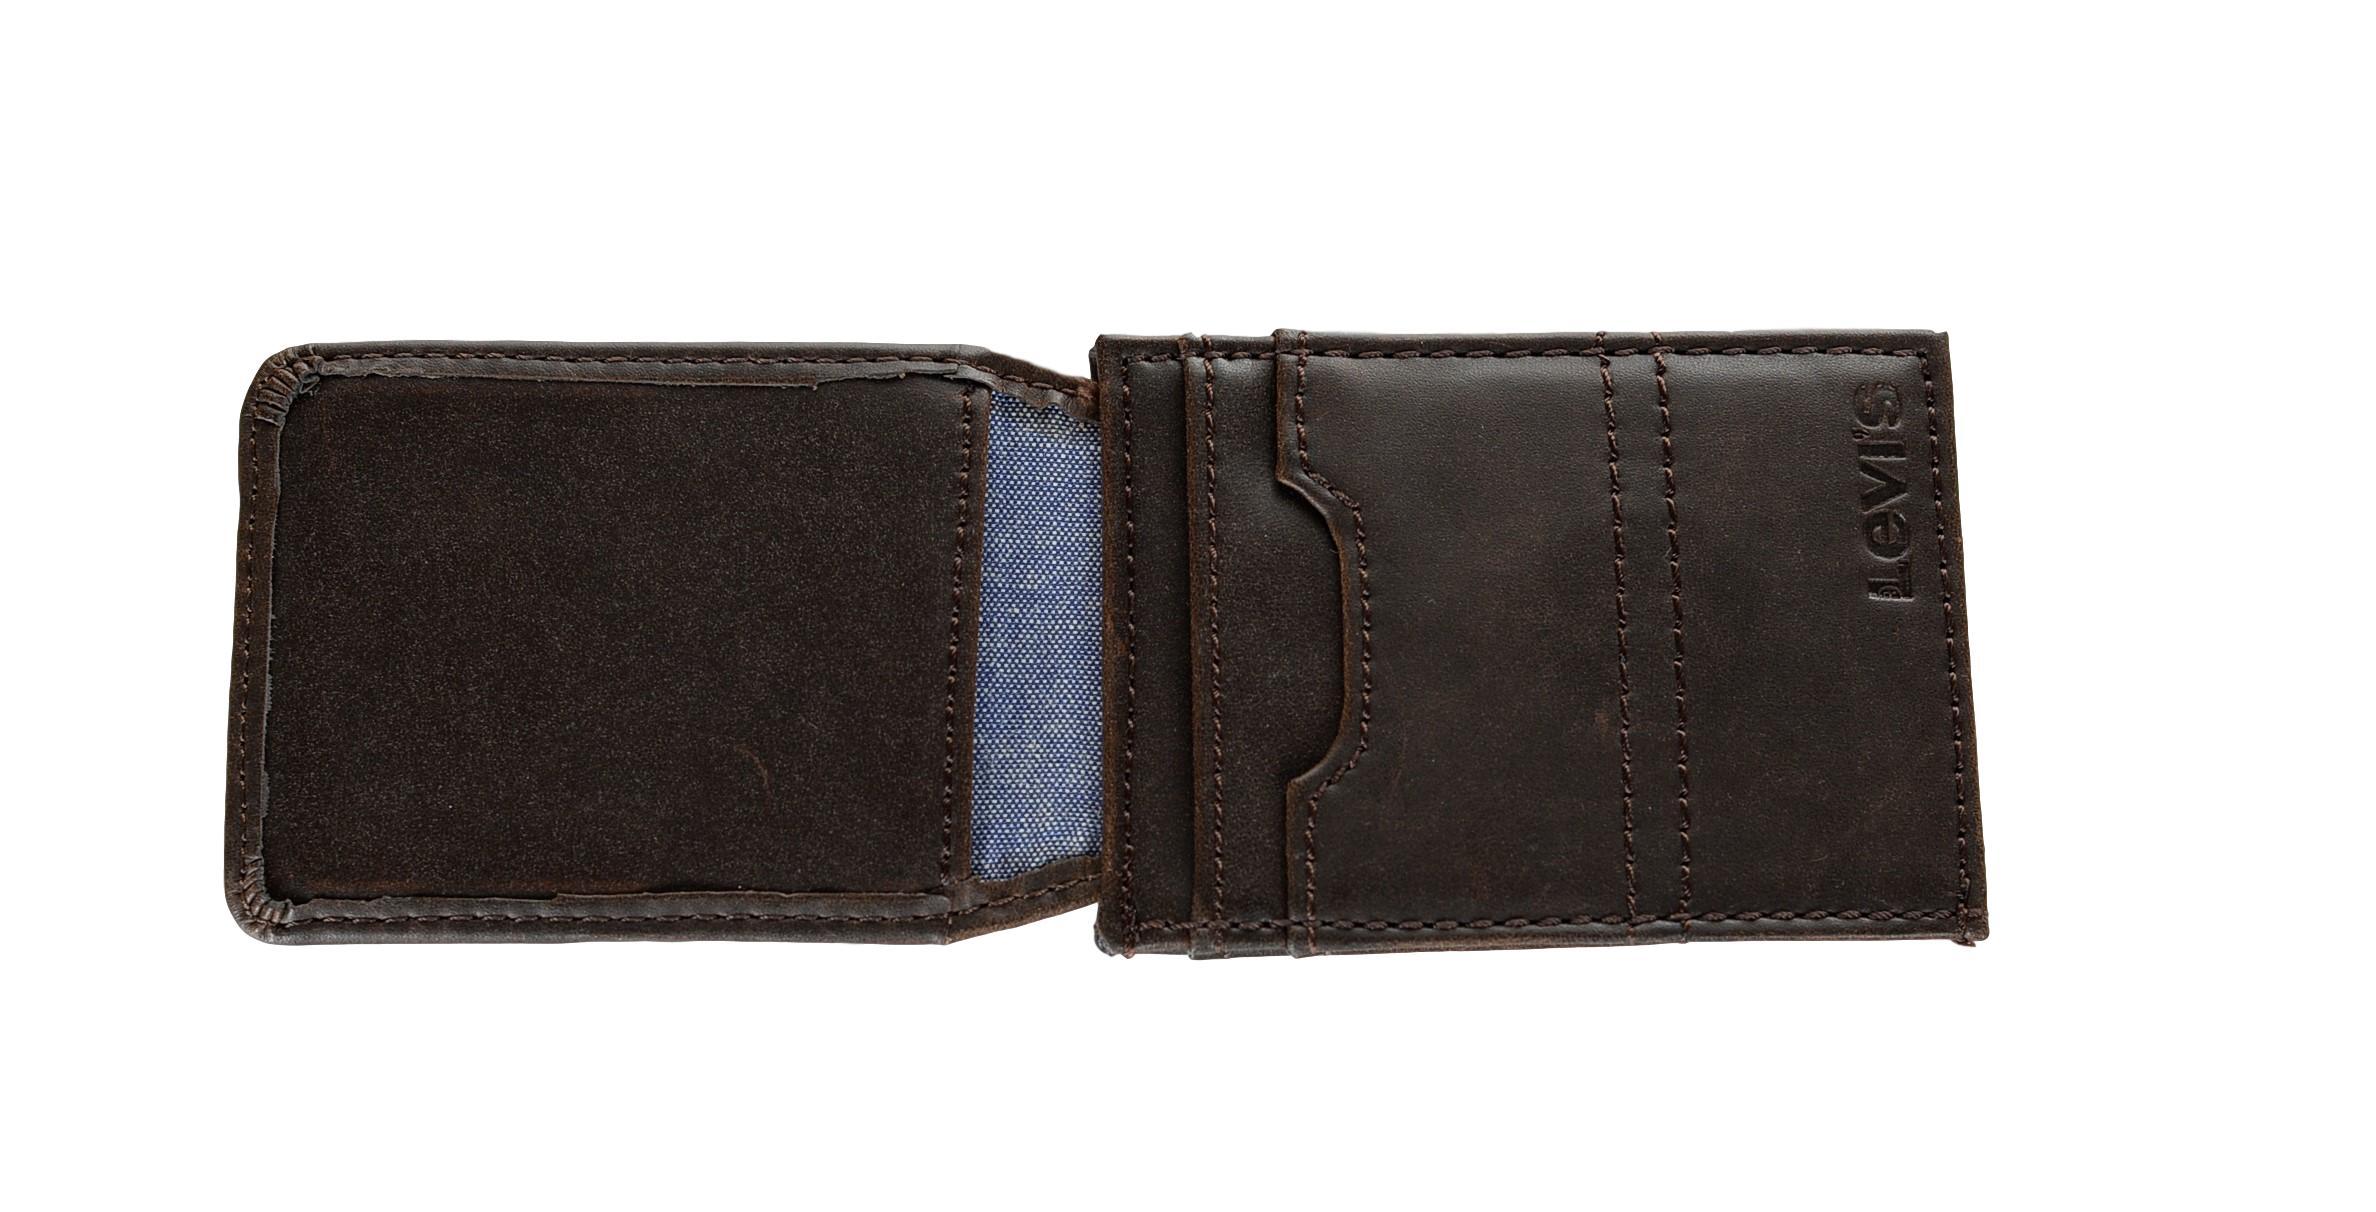 1970fad0f Levi's Men's Leather Magnetic Money Clip Front Pocket Wallet | eBay